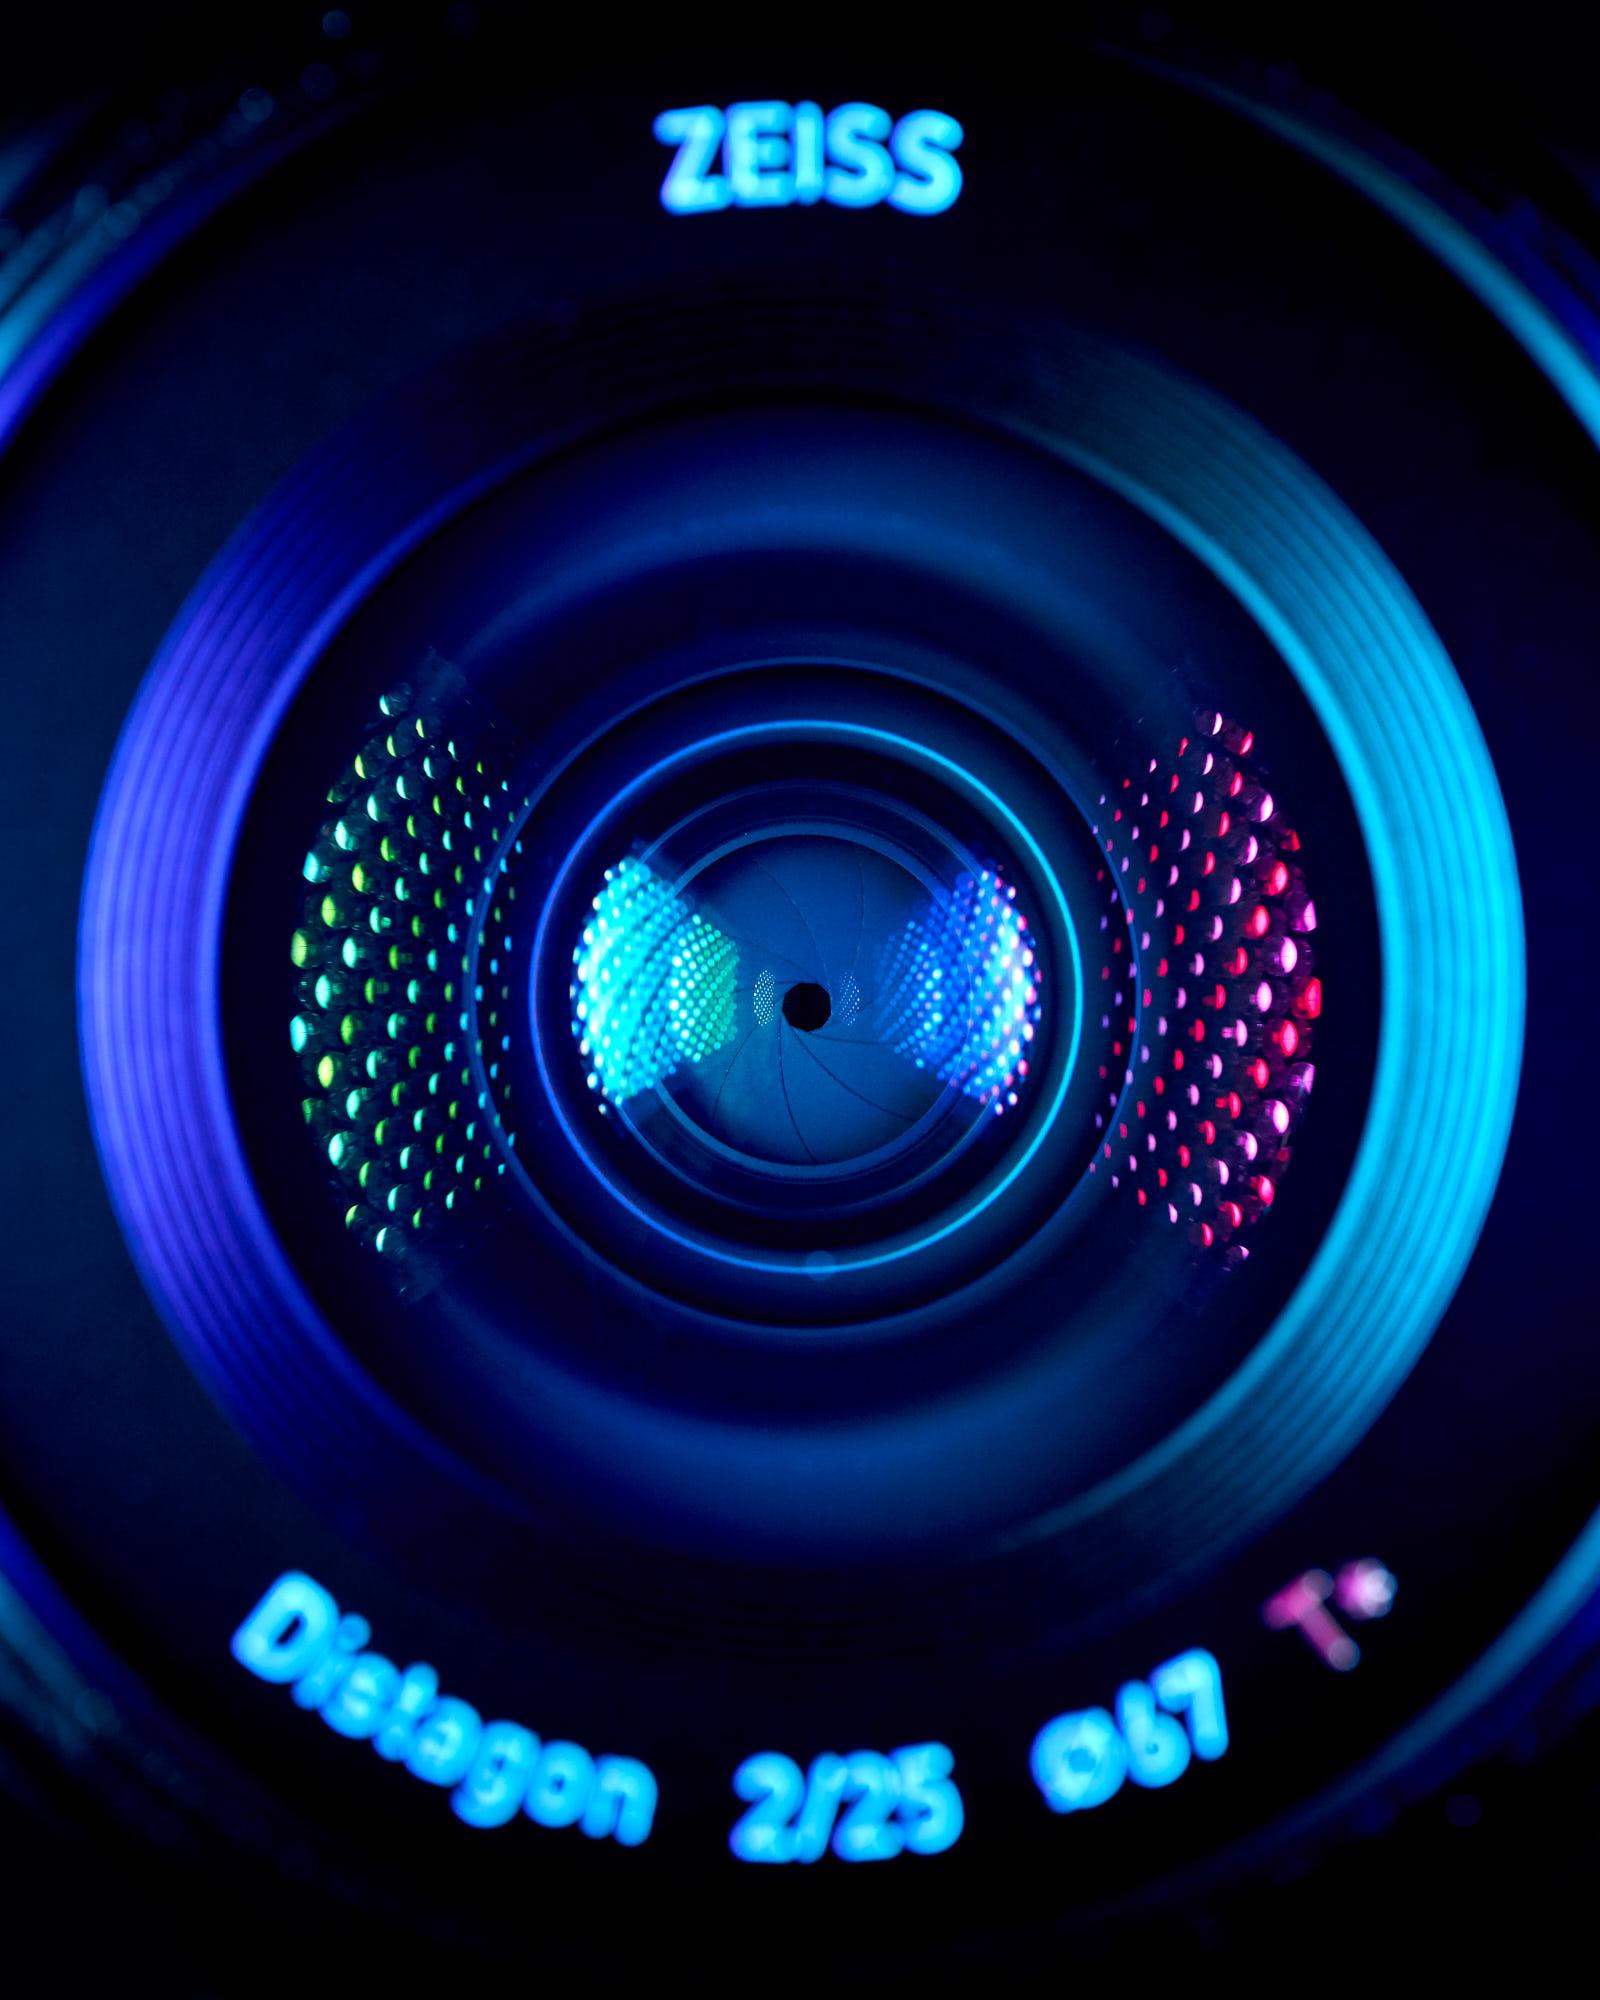 Lex & Josh Zeiss Batis 25mm Product Shoot 3.jpg